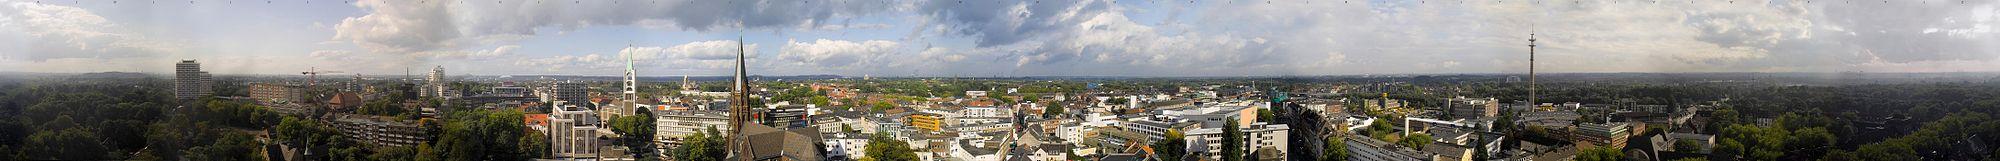 Panorama of Gelsenkirchen